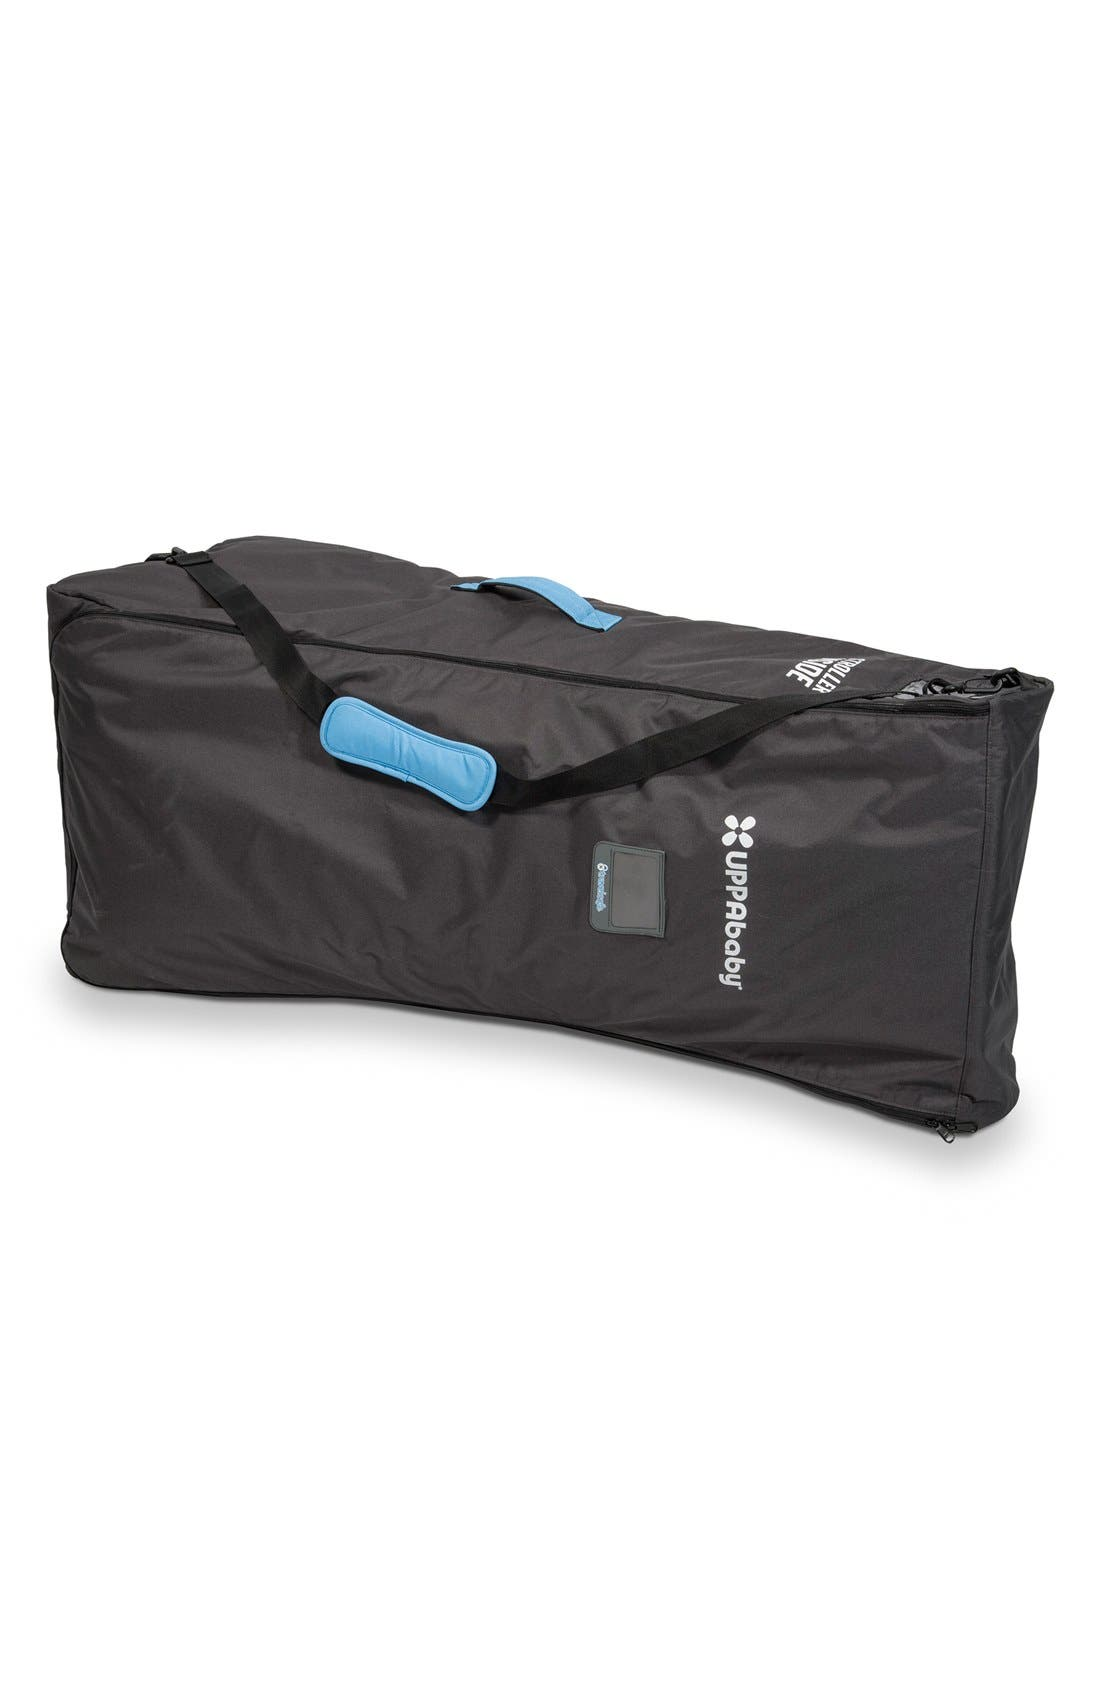 'G-LINK<sup>™</sup>' Side by Side Stroller Travel Bag,                             Main thumbnail 1, color,                             black